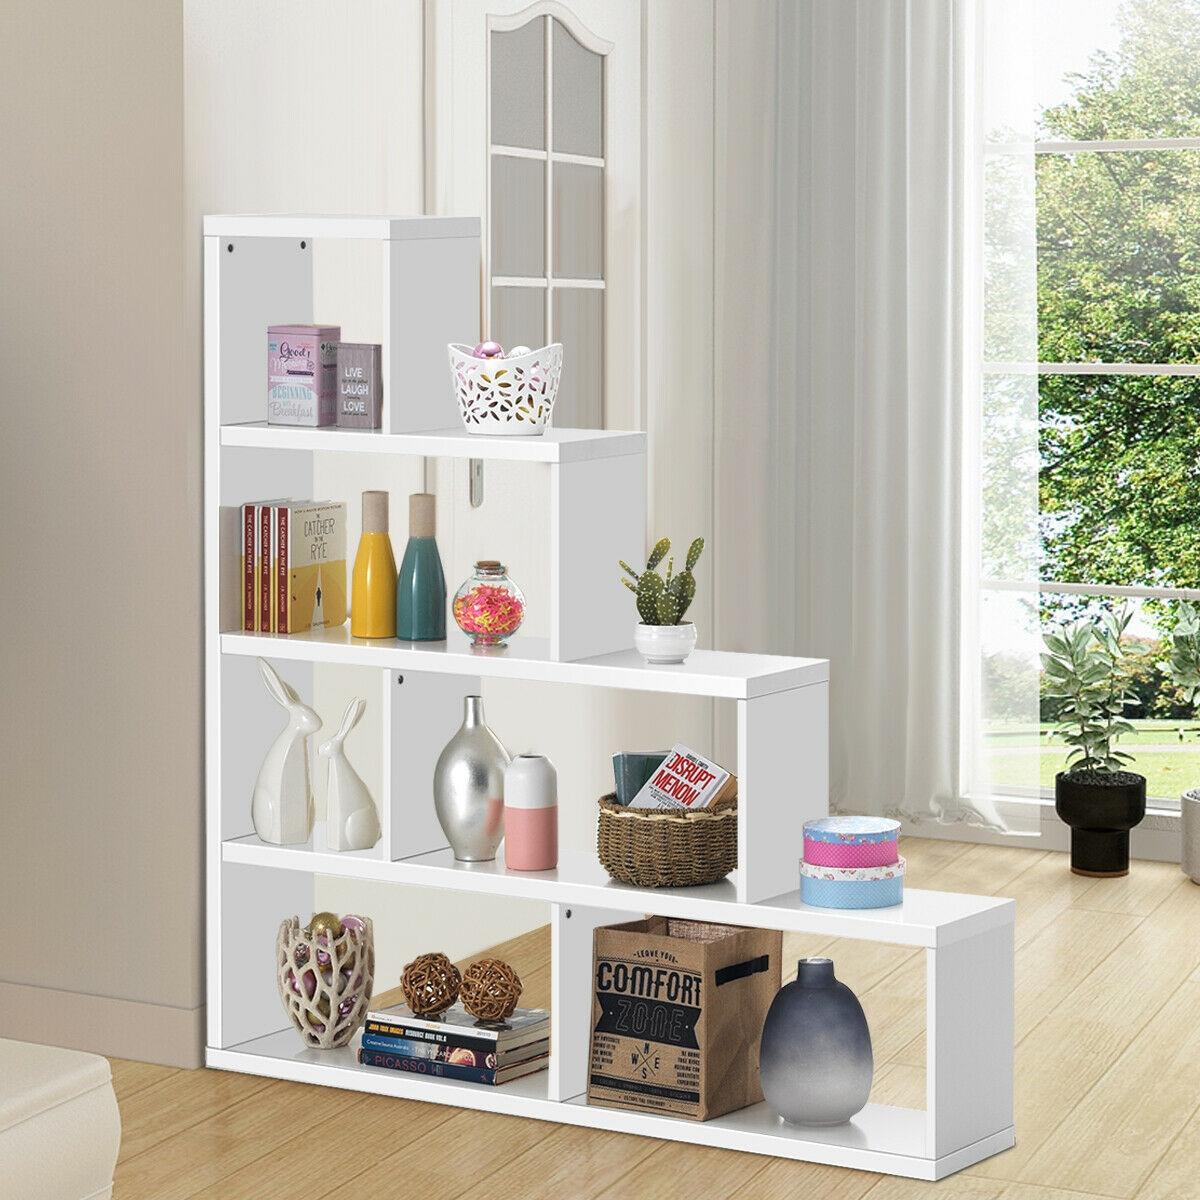 6 Cubes Ladder Shelf Corner Bookshelf Storage Bookcase